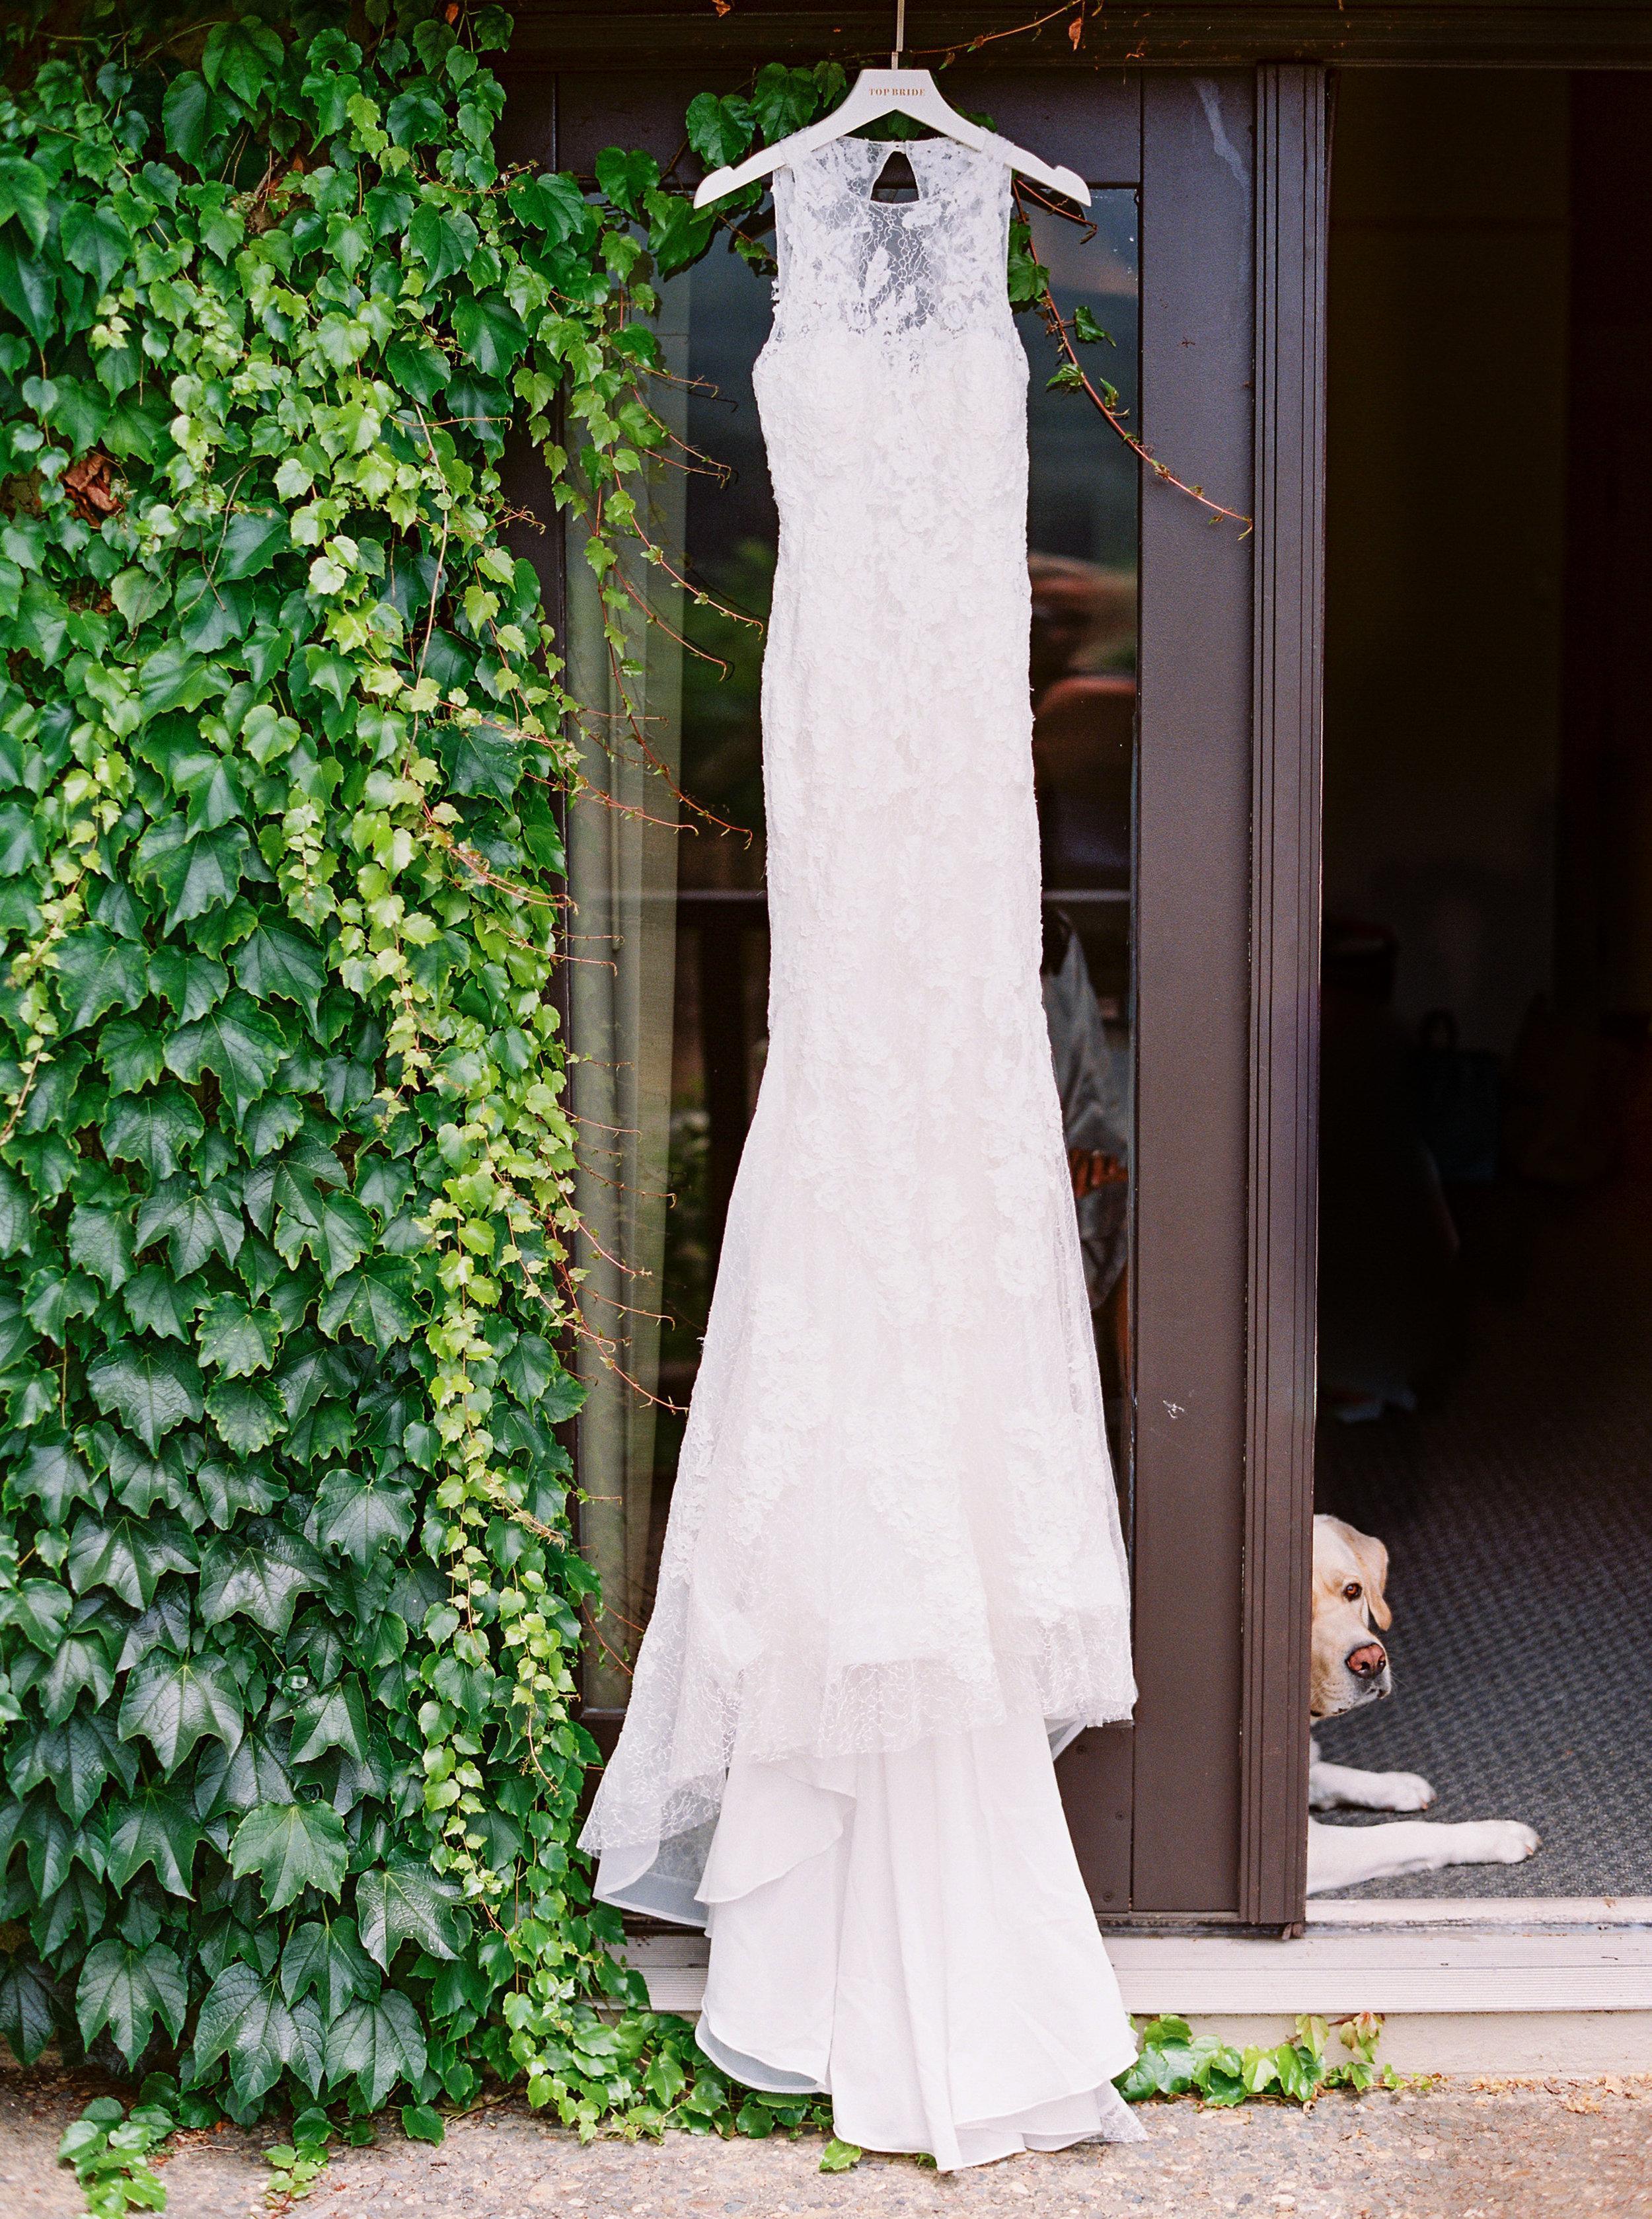 Harvest-inn-wedding-in-napa-california-278.jpg